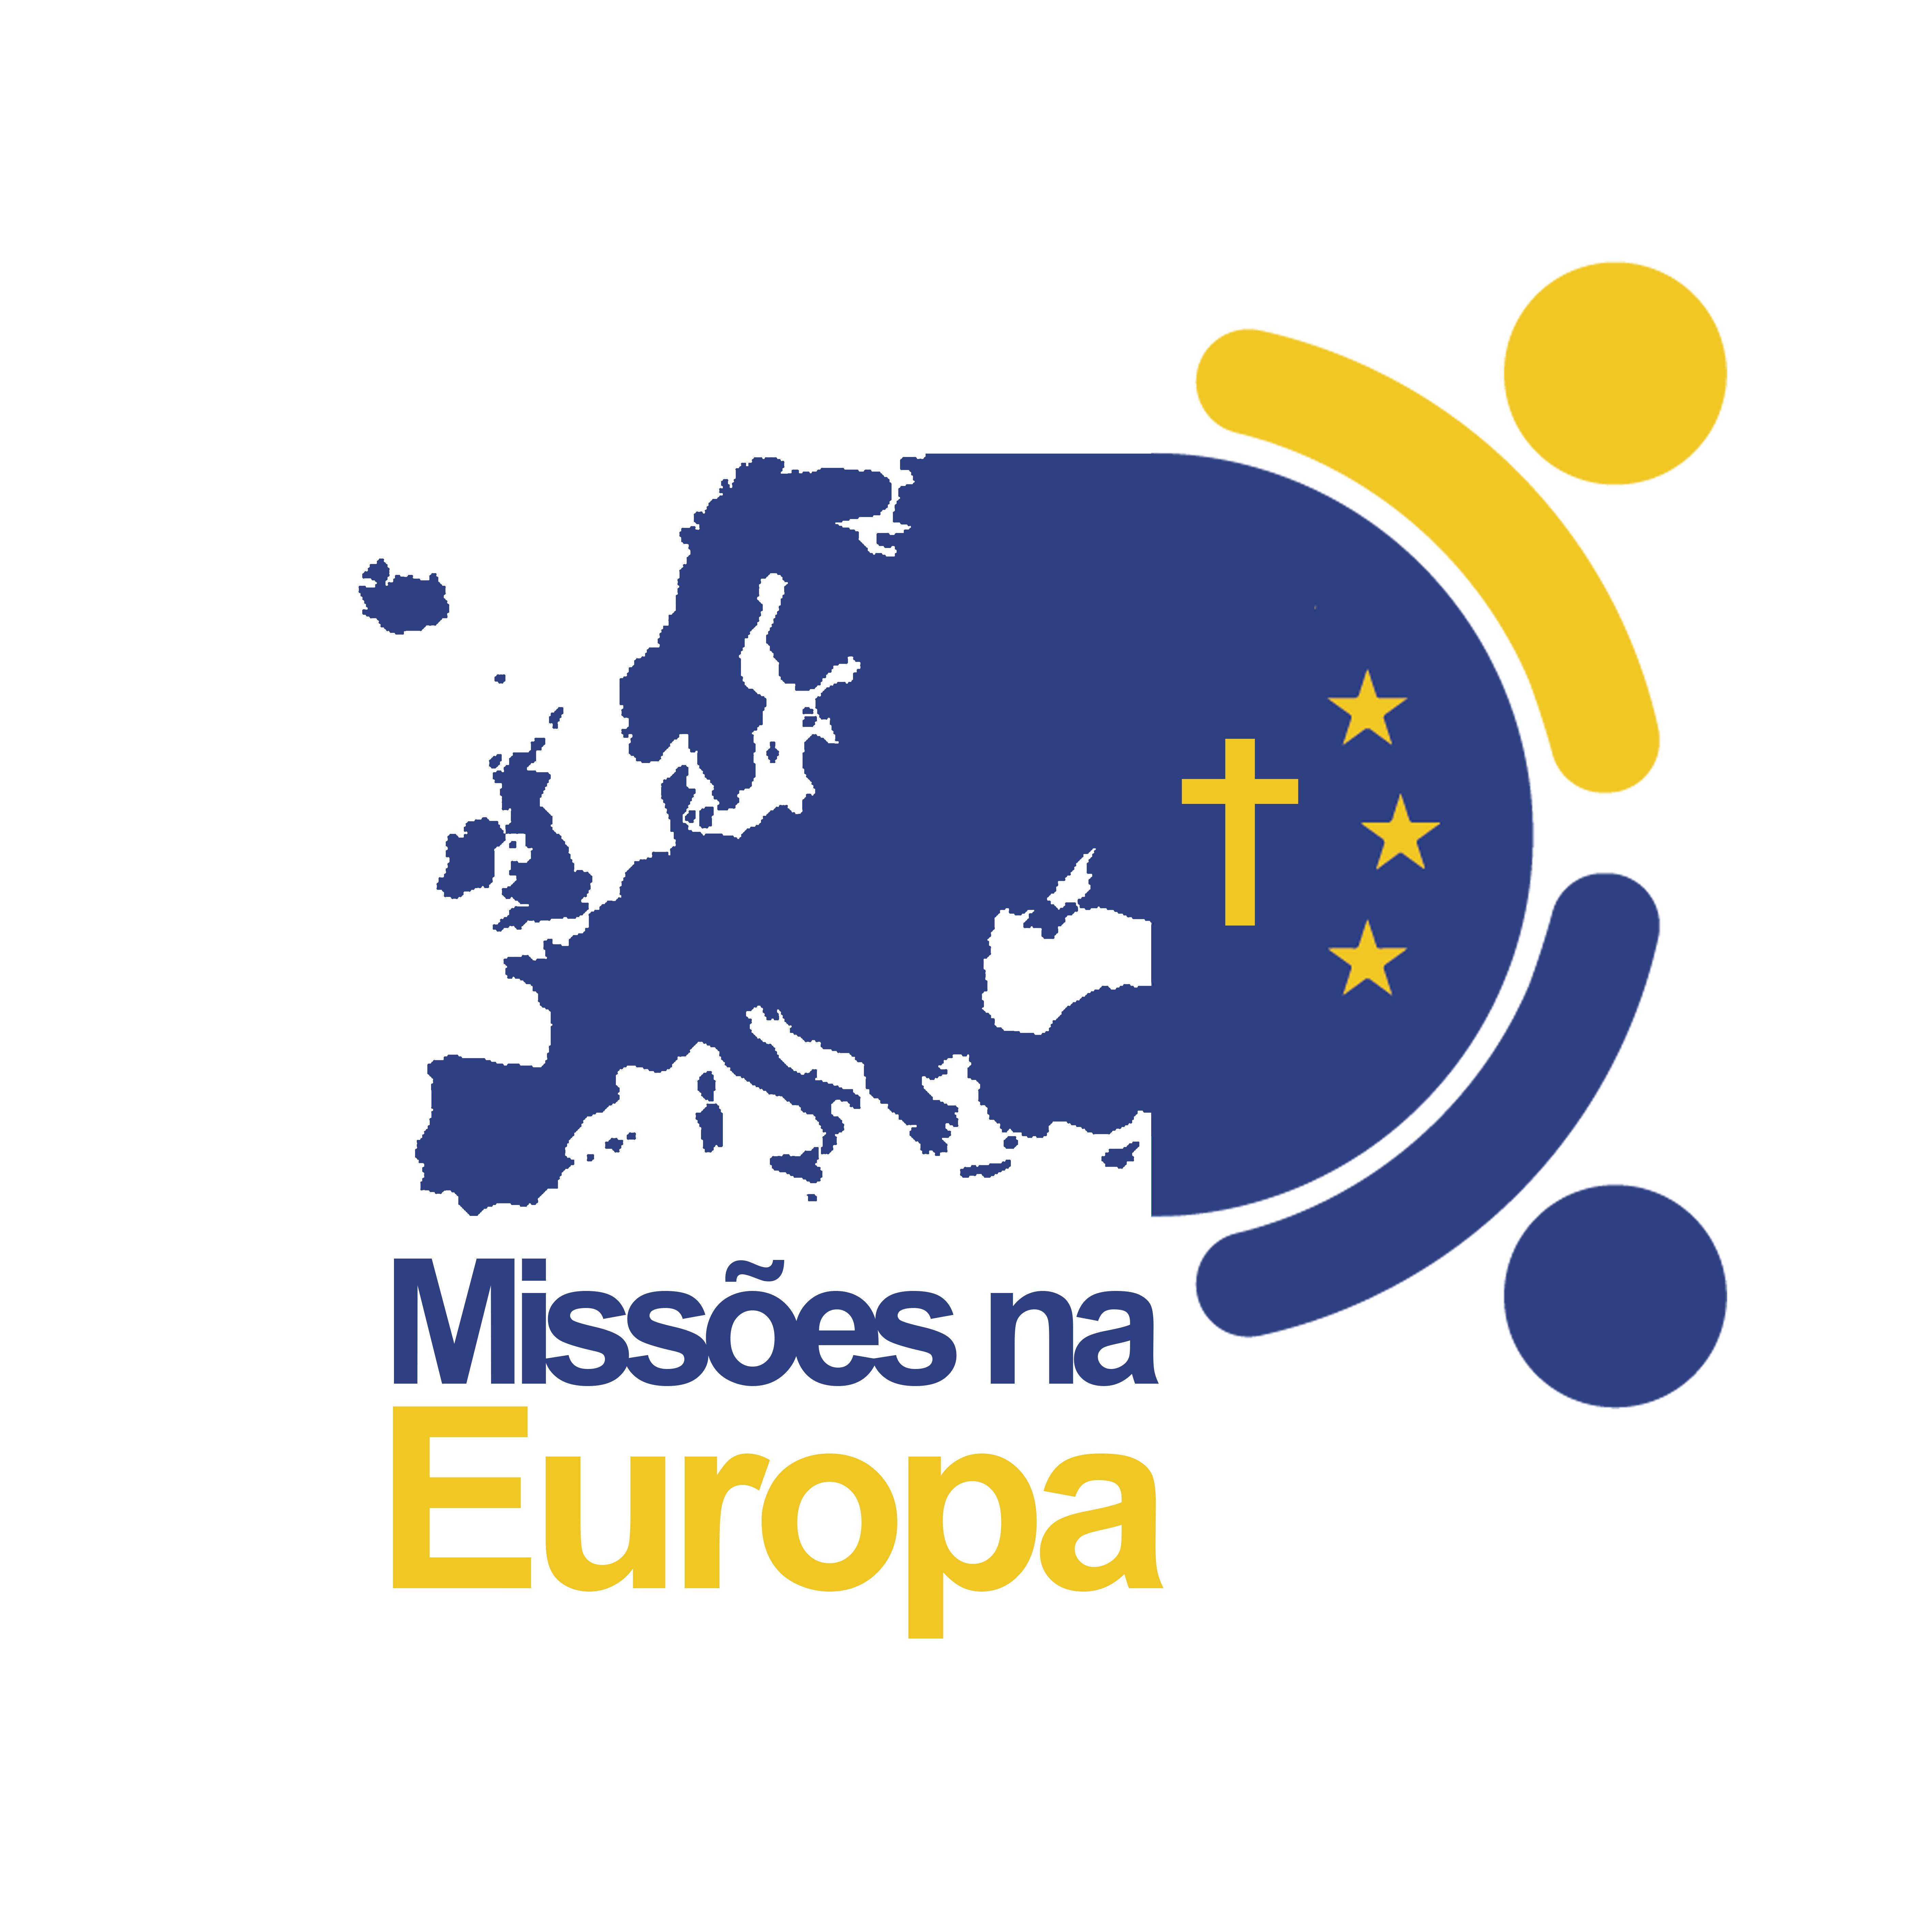 Logotipo   fundo branco